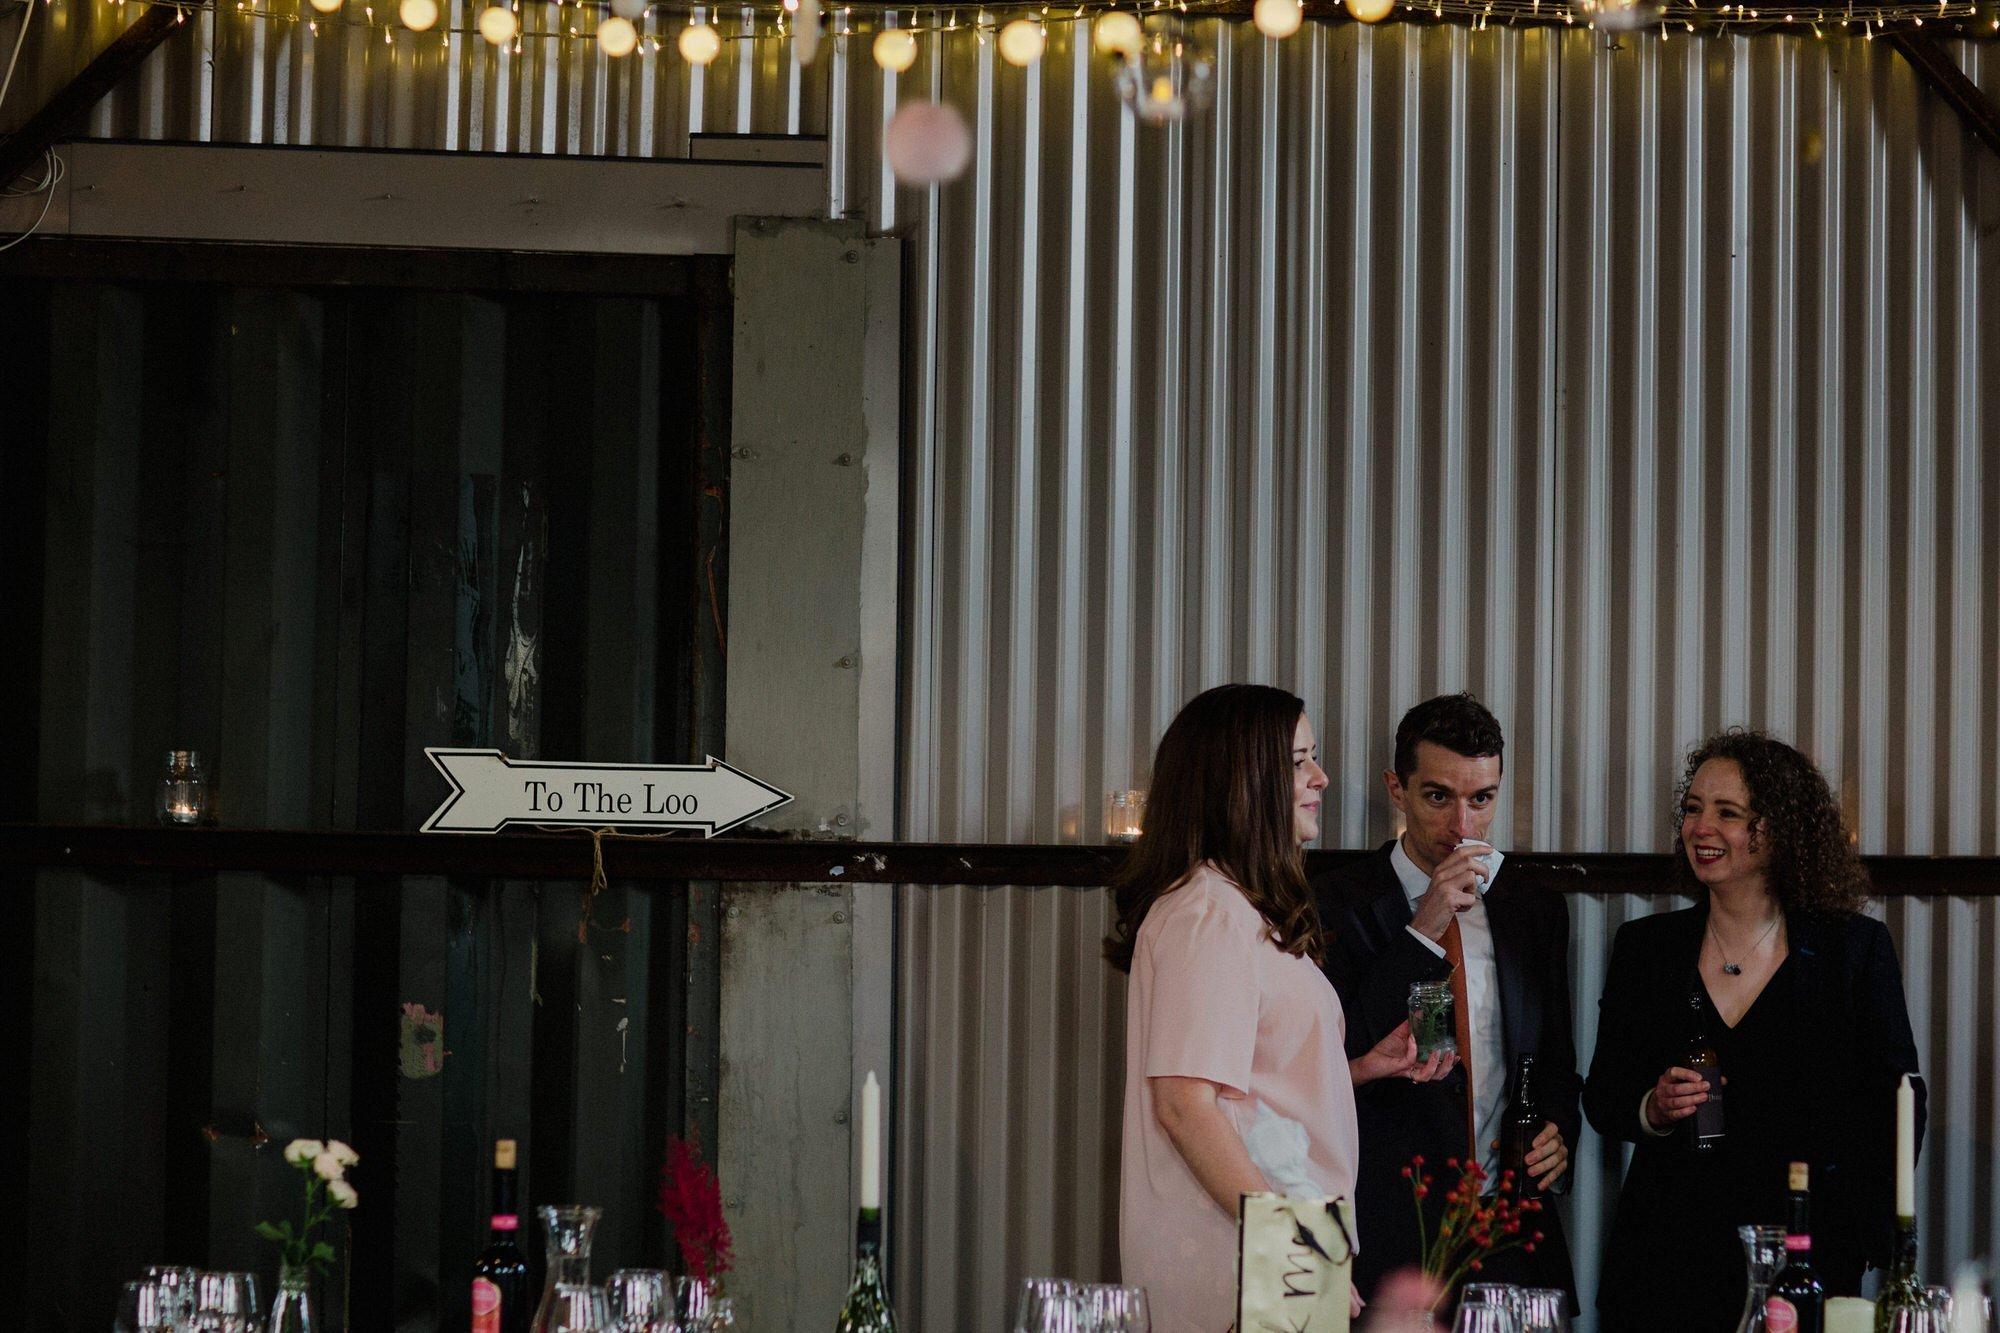 040 TIN SHED KNOCKRAICH FARM WEDDING ALTERNATIVE BRIDE ZOE ALEXANDRA PHOTOGRAPHY